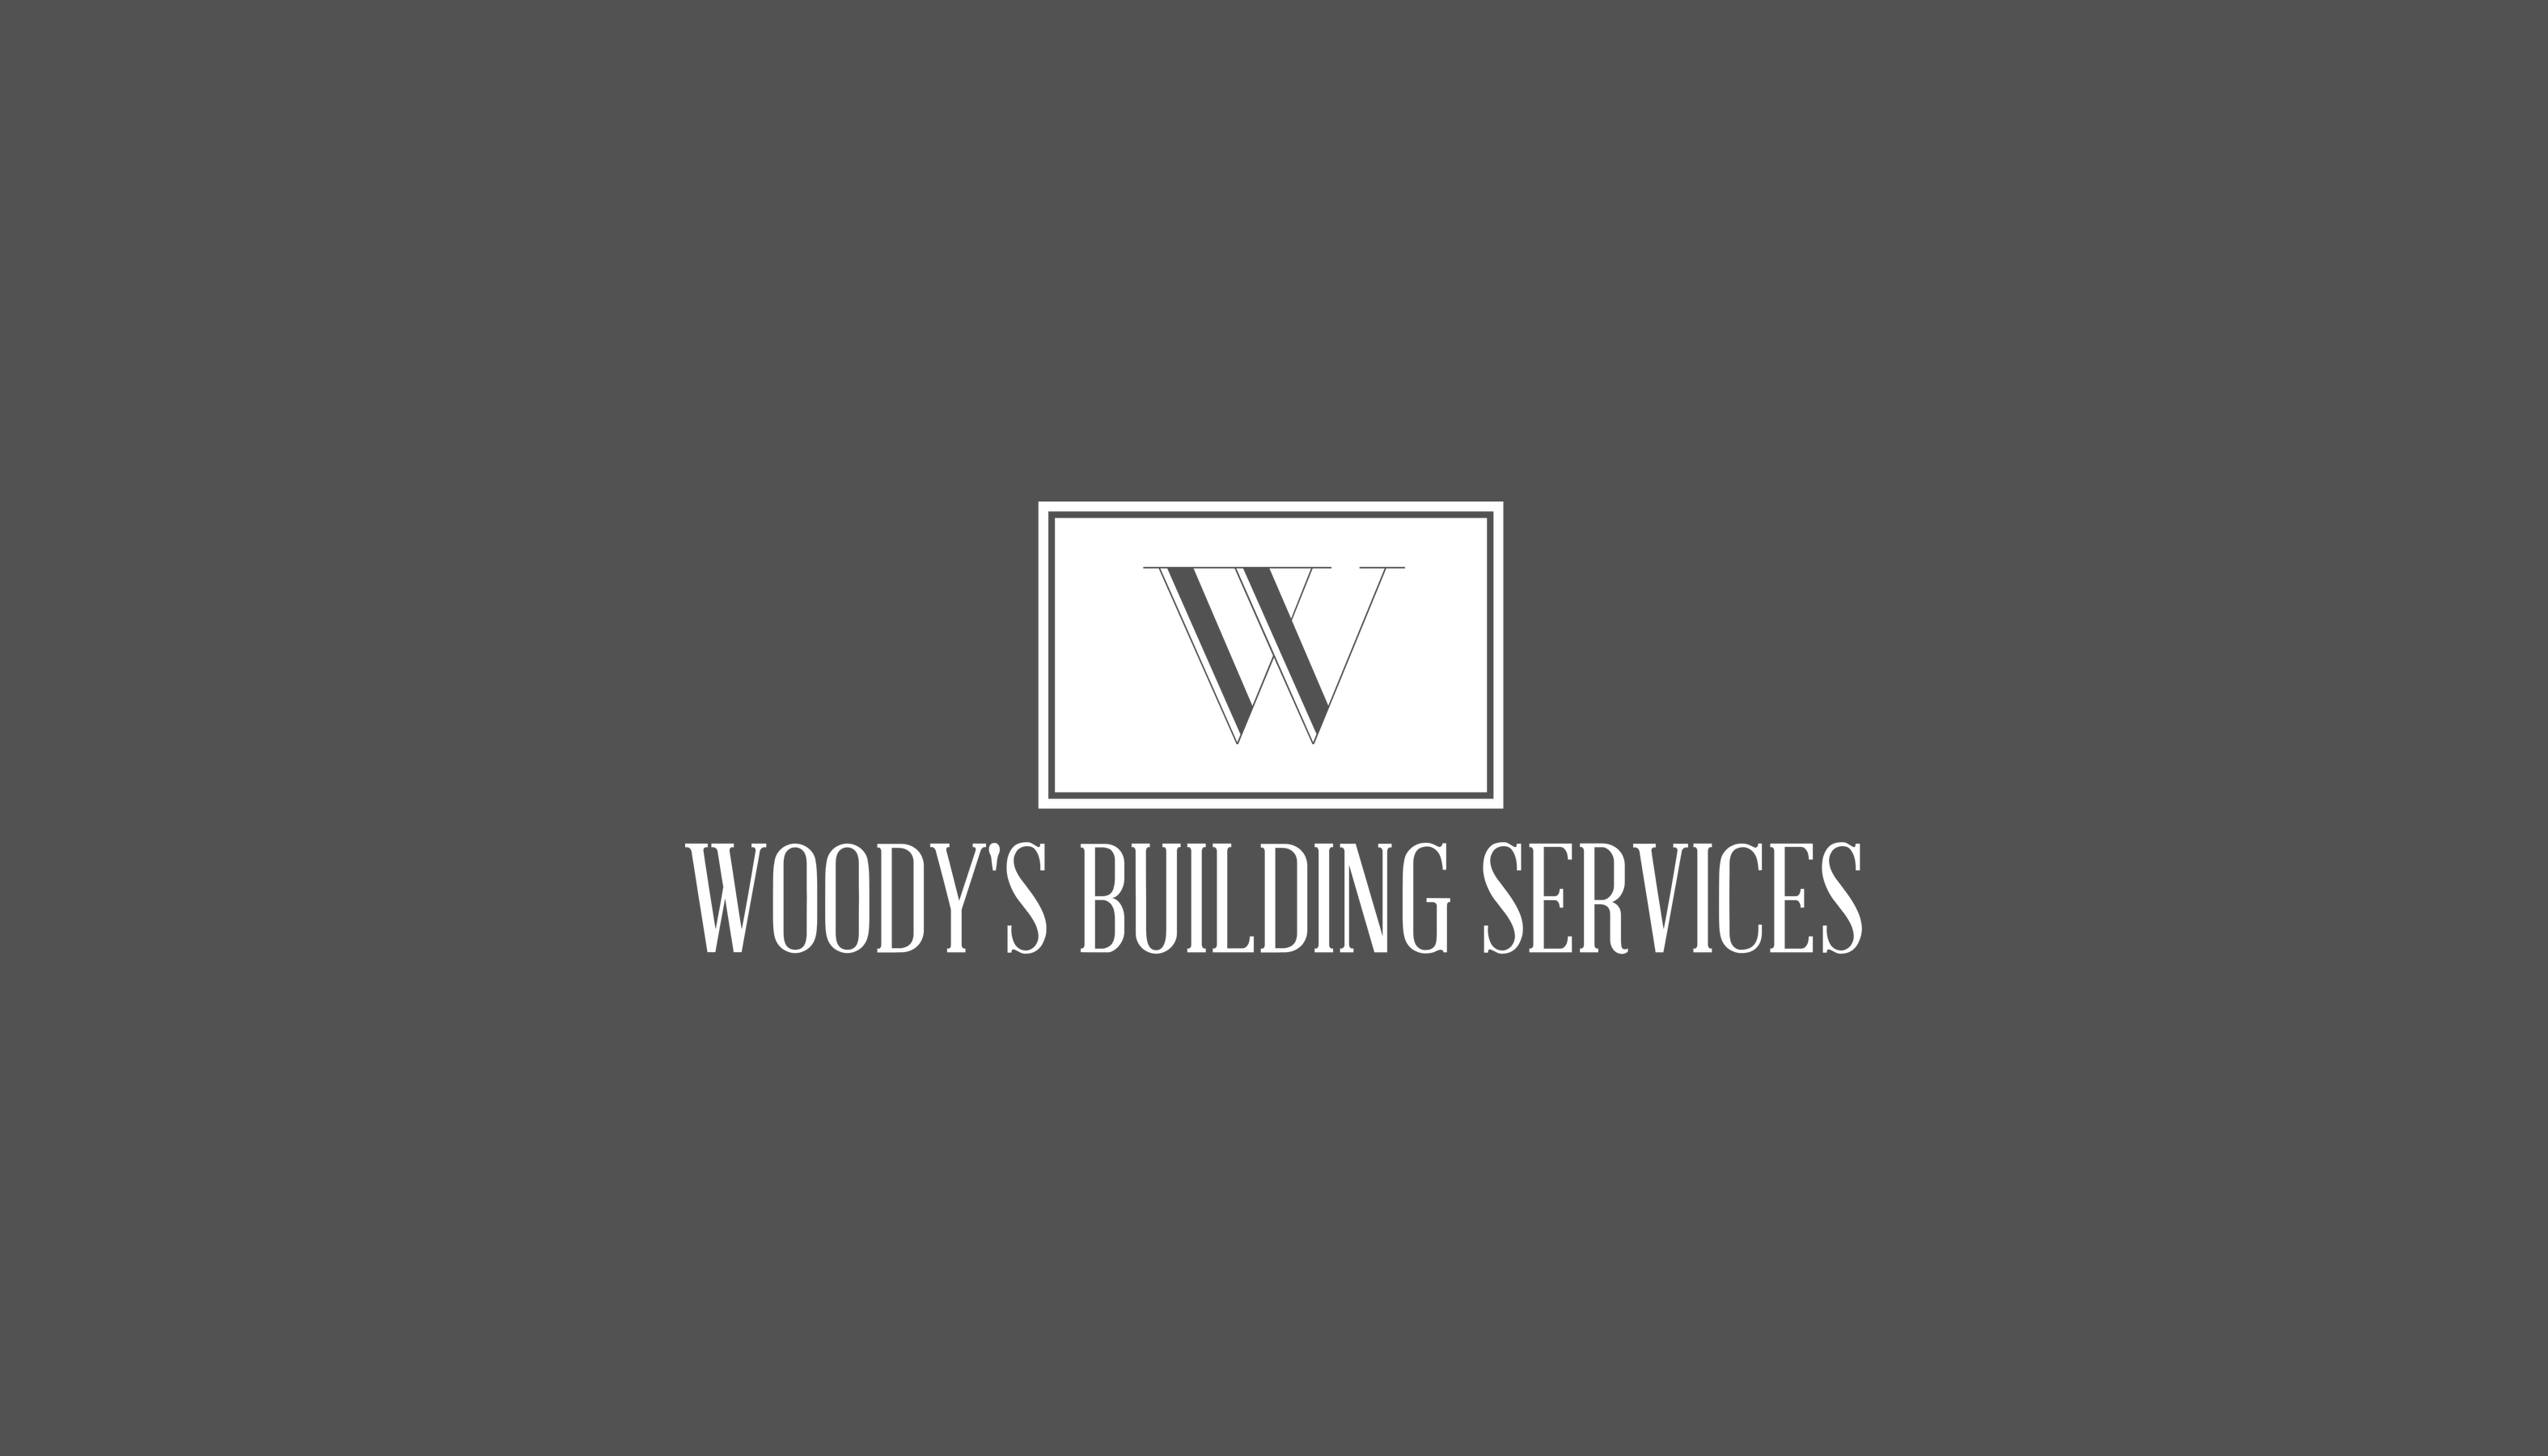 Woody's Building Services Ltd Verified Logo